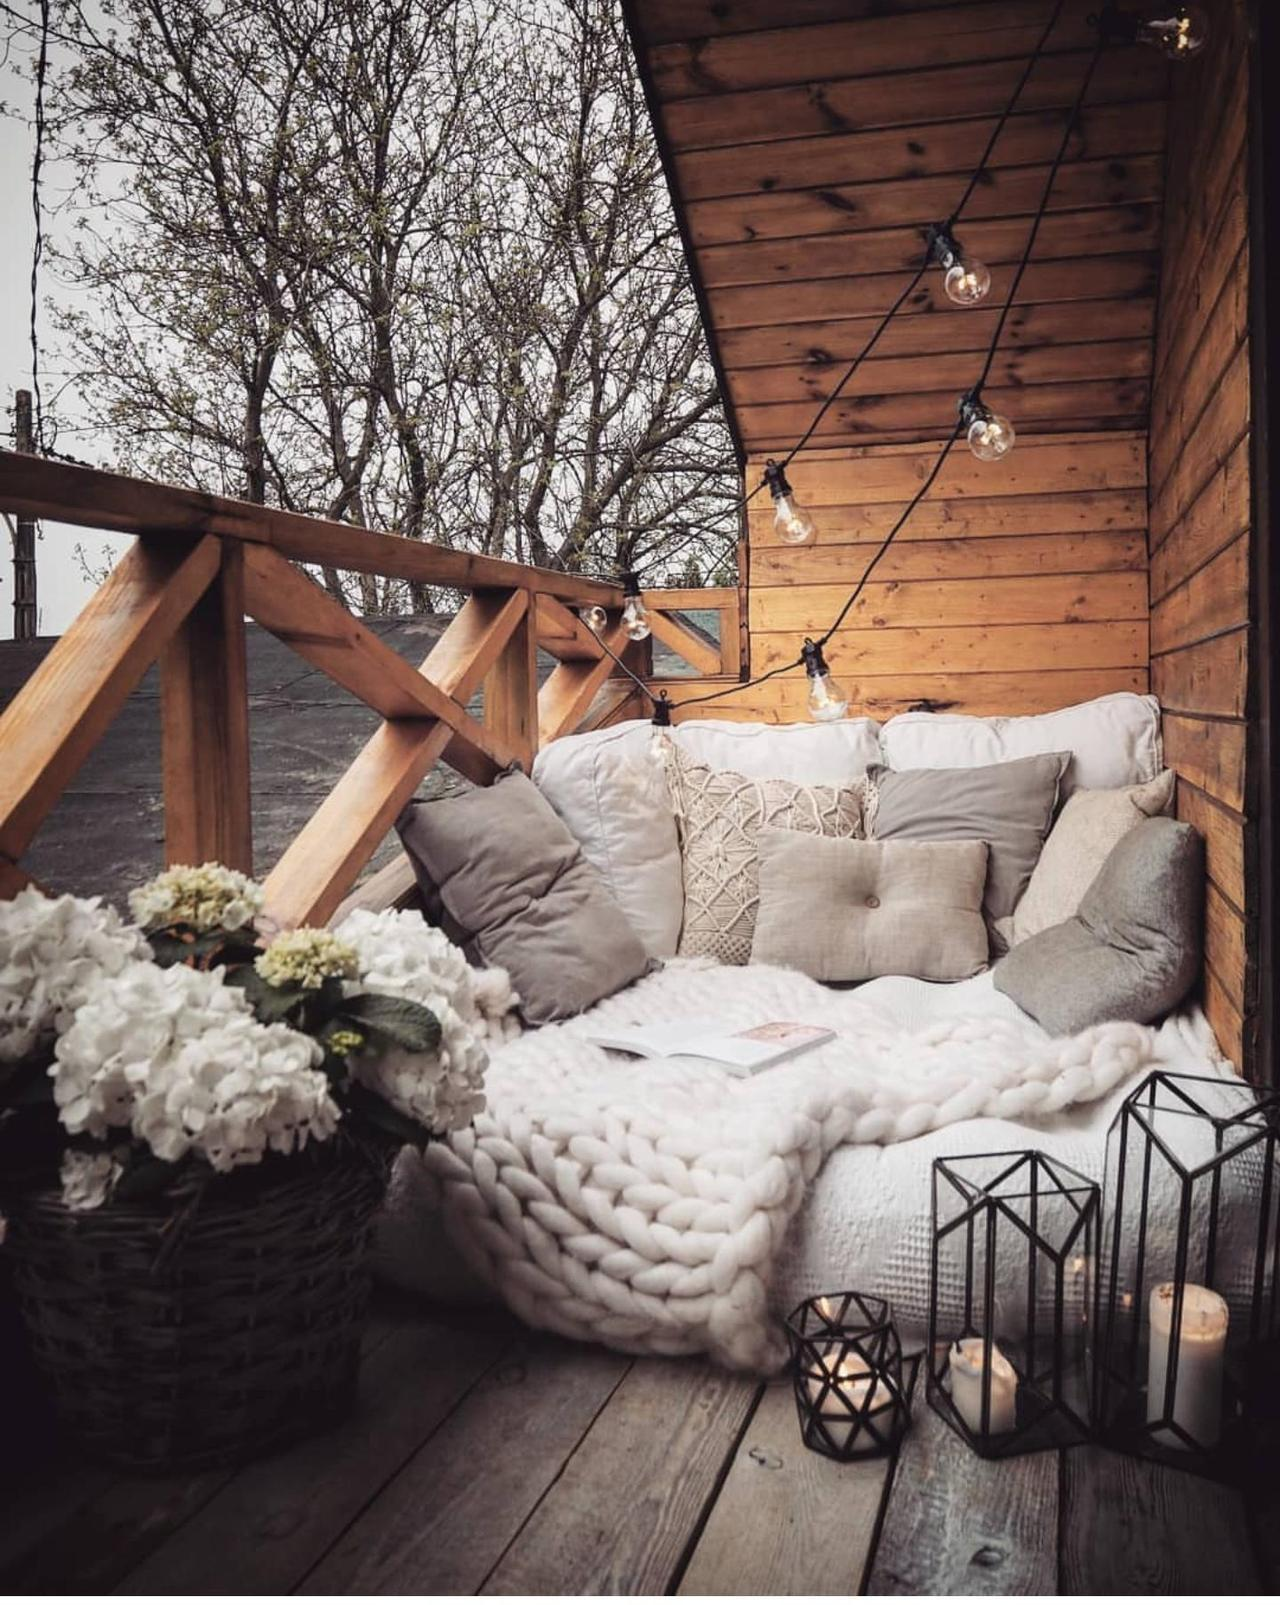 wonderful pillowed hammock-bed.